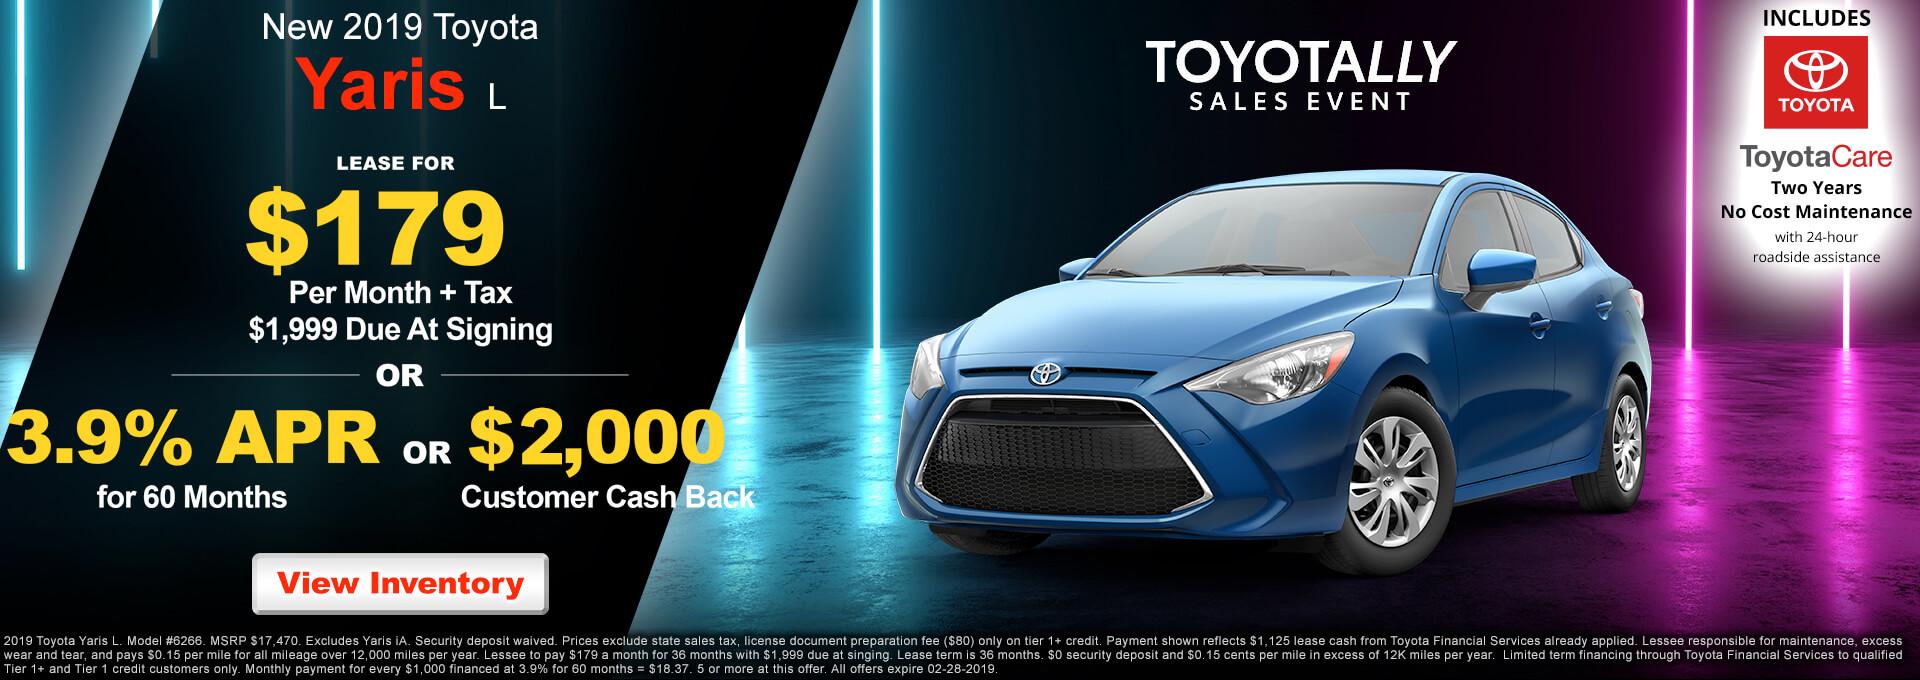 2019 Toyota Yaris $179